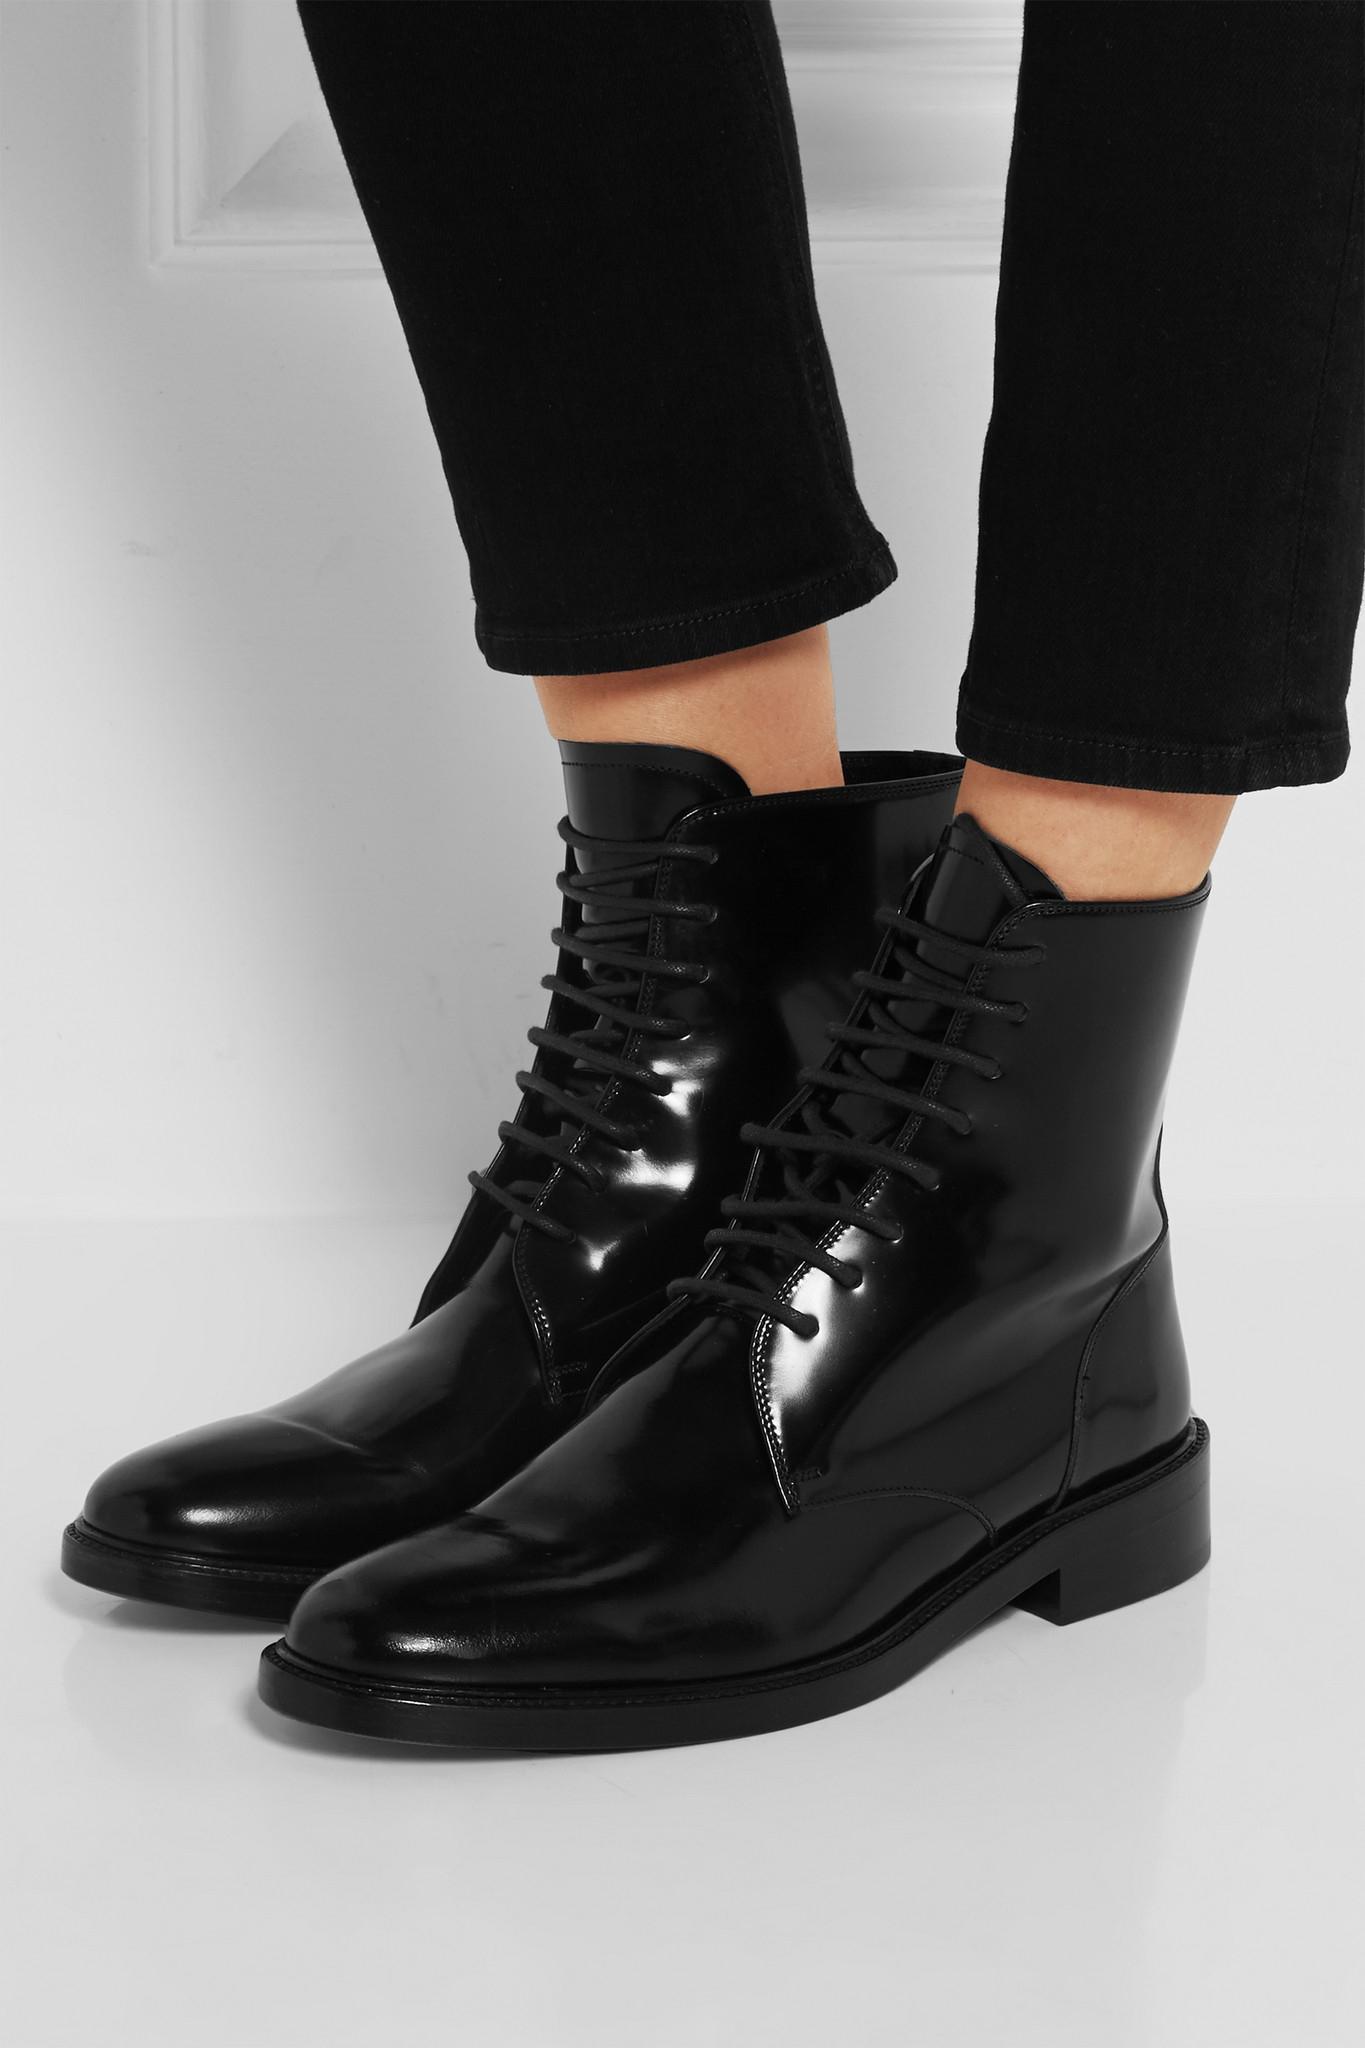 Nautica Leather Shoes Black